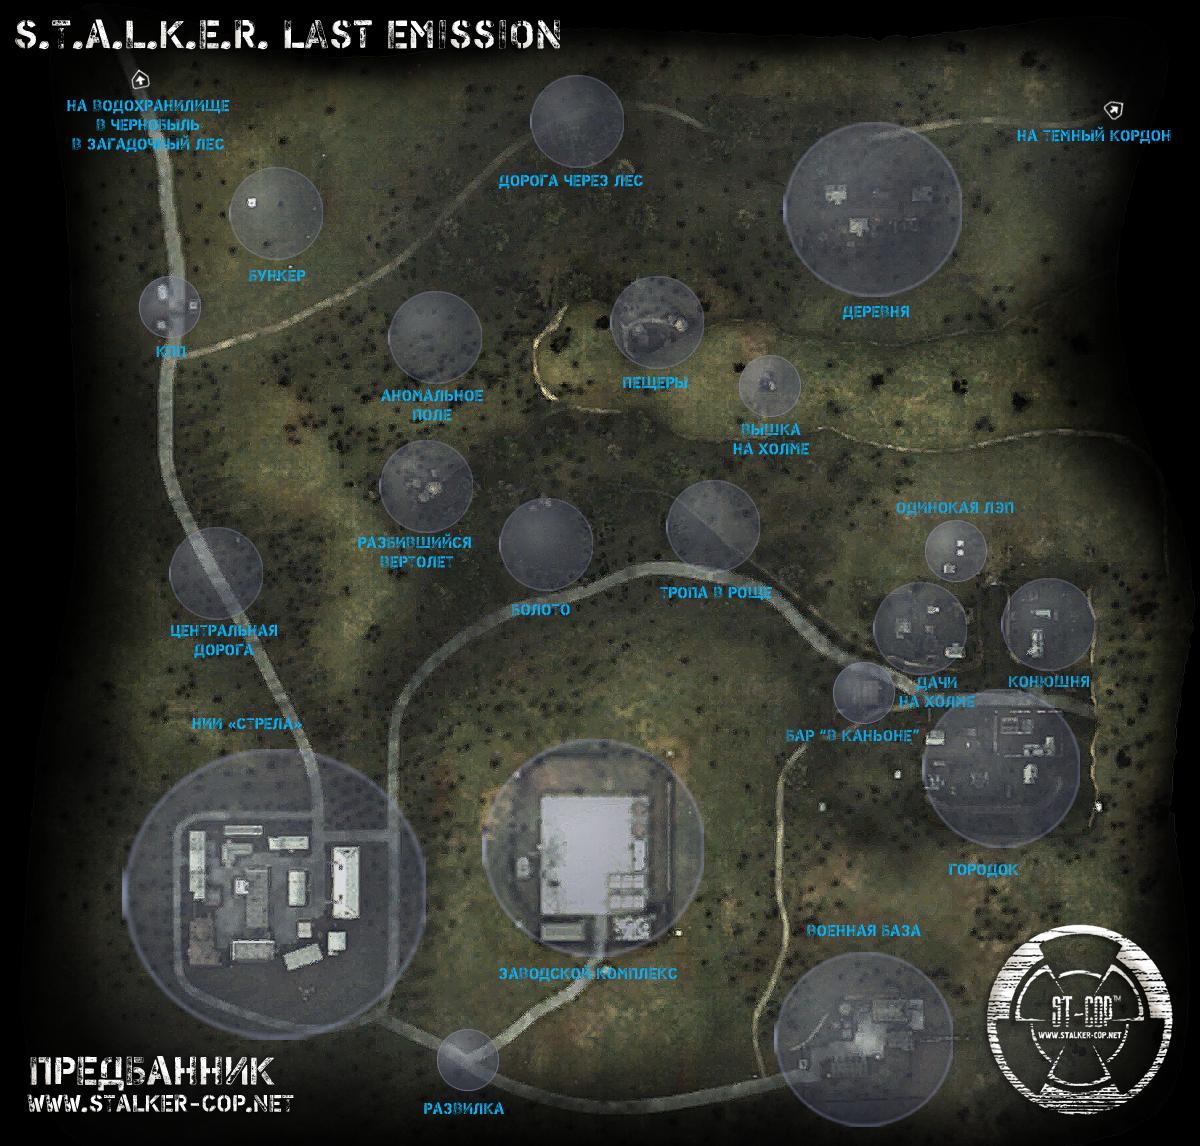 карты зоны -  Карта Зоны Zxnqeq